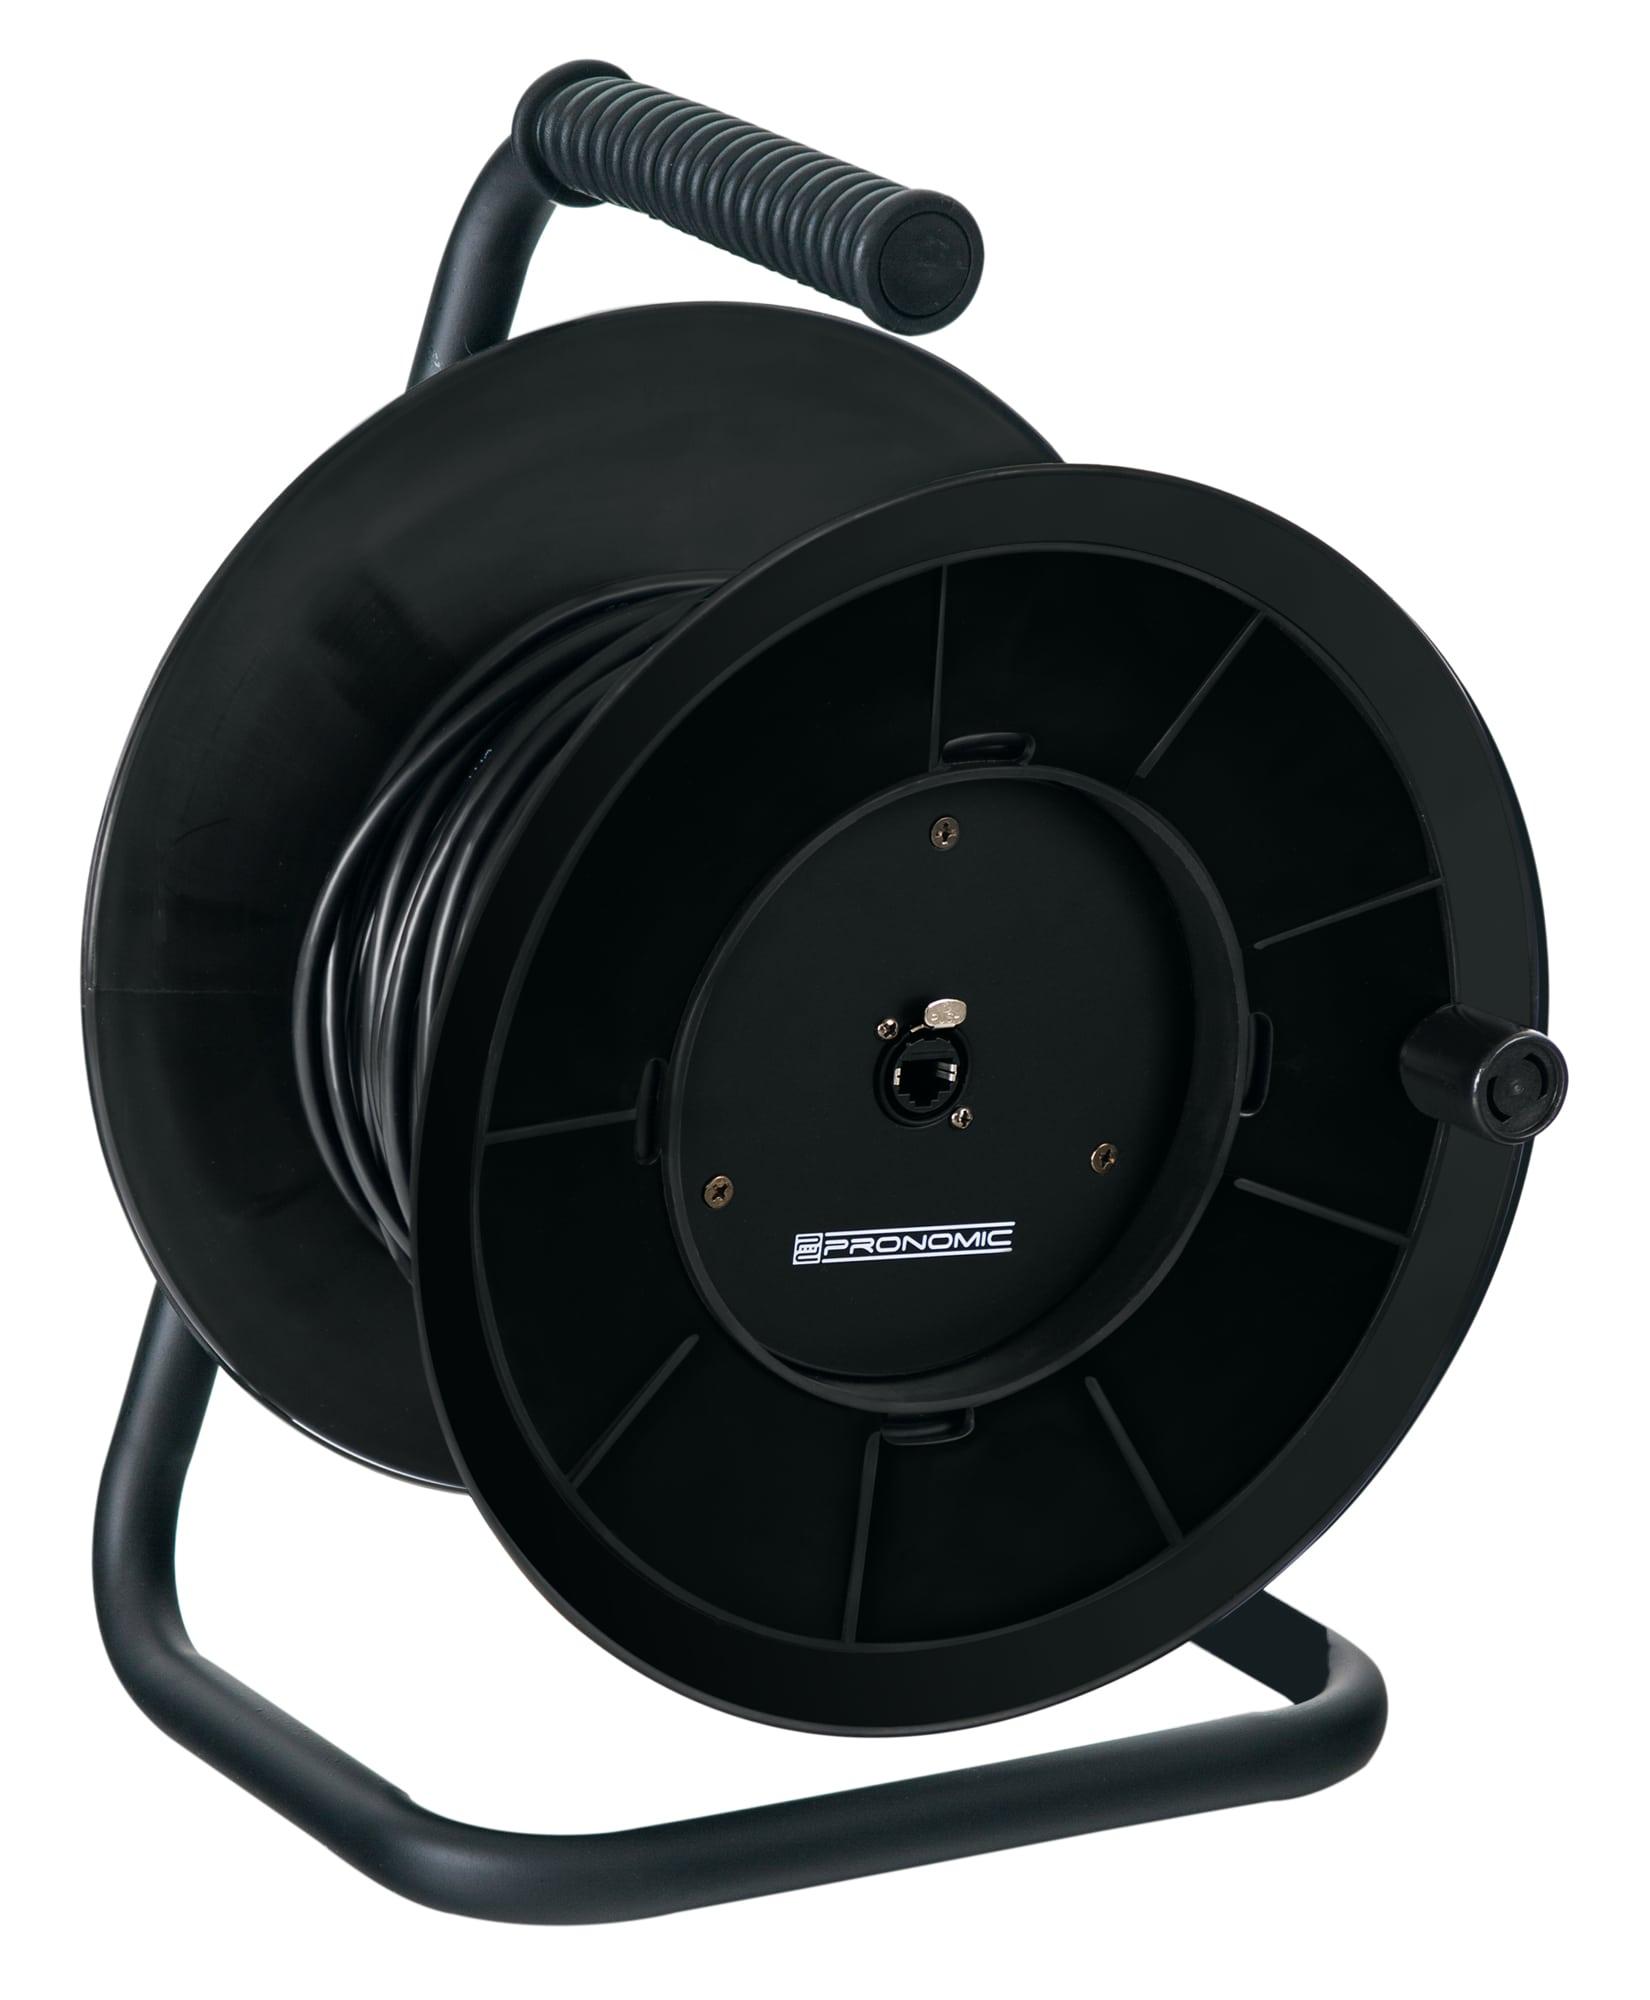 Kabelmulticores - Pronomic Stage ECAT5 50 Ethernet Kabeltrommel 50m - Onlineshop Musikhaus Kirstein